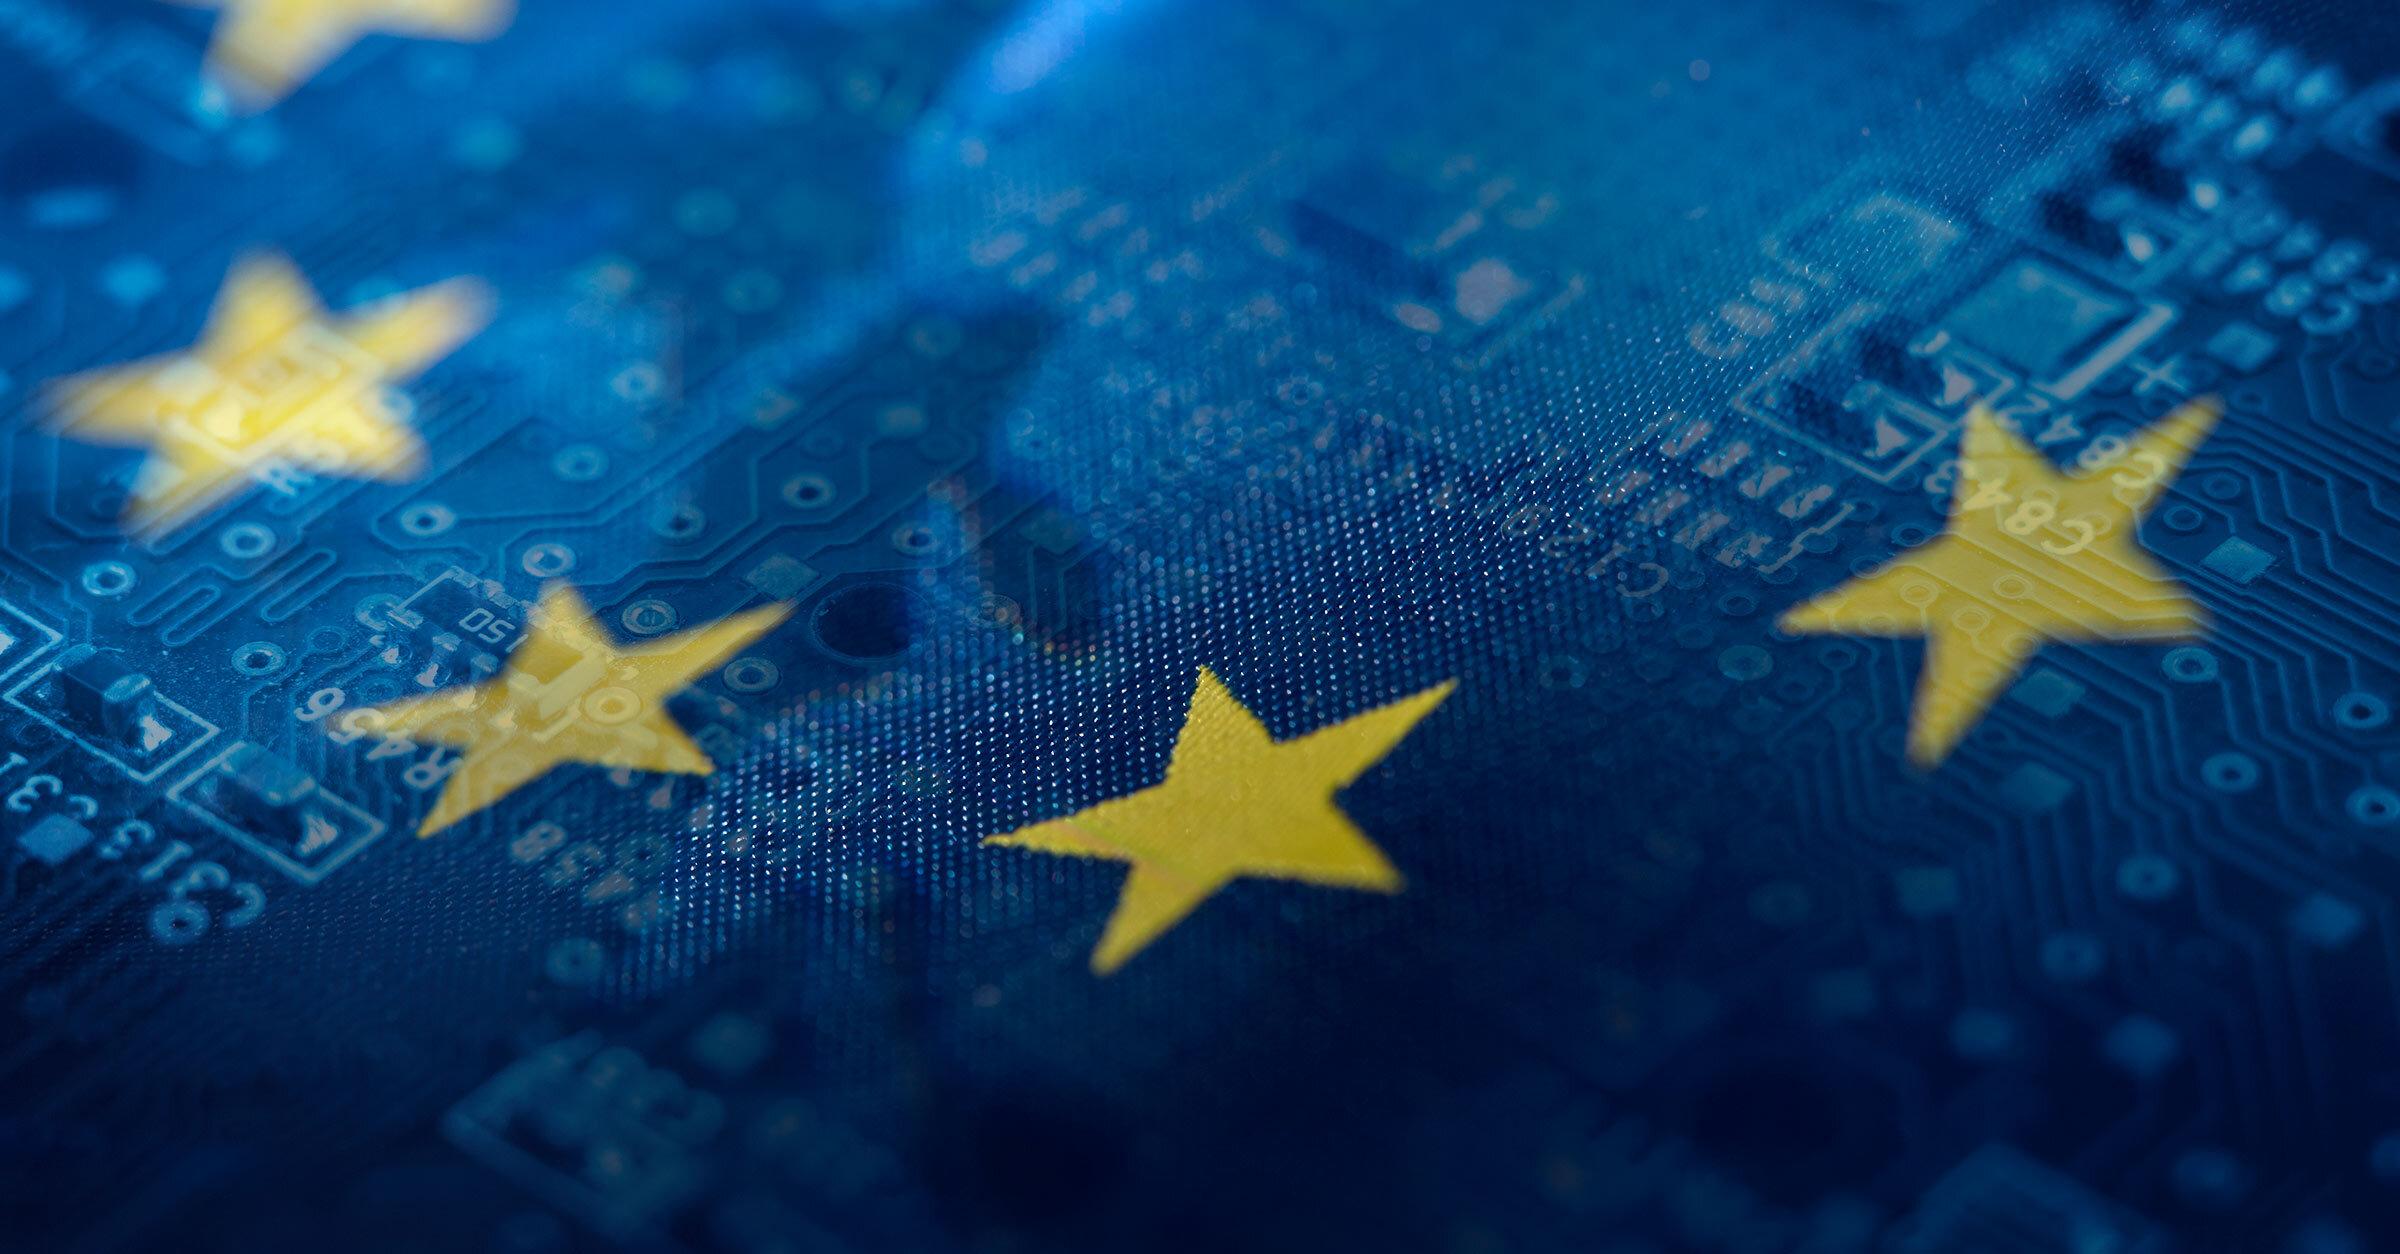 A robust approach? EU proposes framework for mandatory regulation of AI